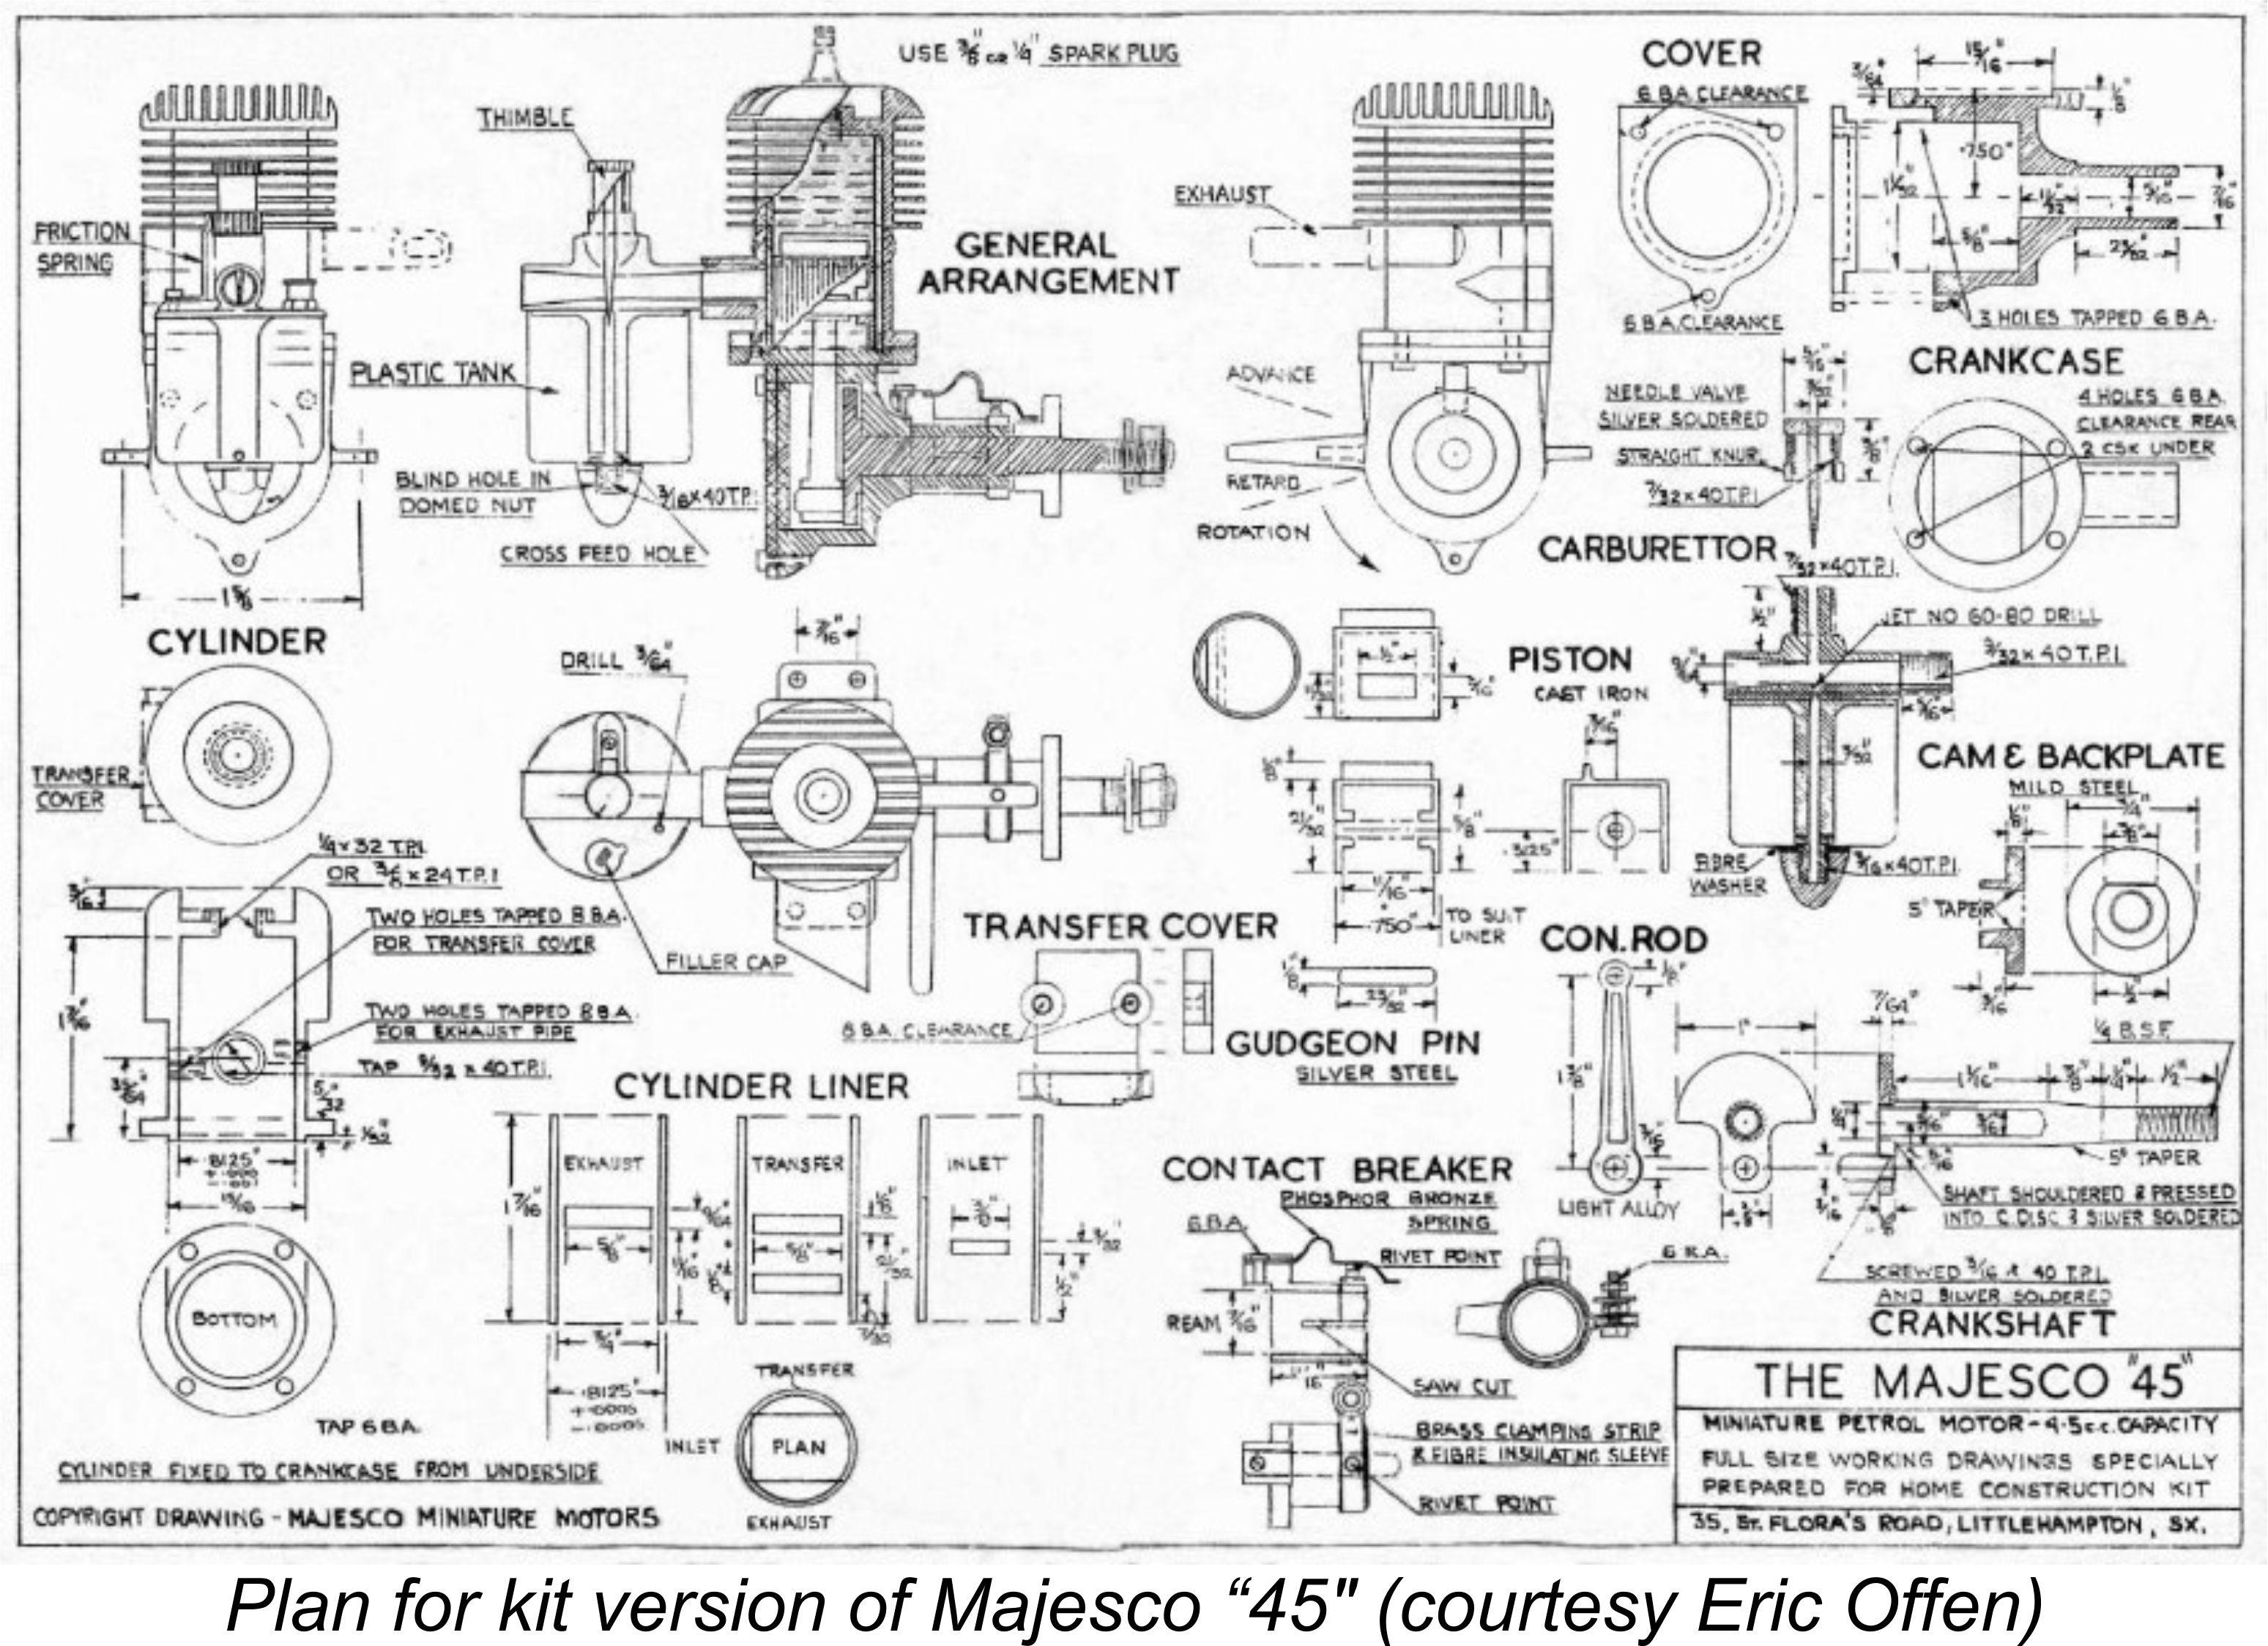 Diagram Of Engines Adriansmodelaeroengines Majesco Motors Of Diagram Of Engines